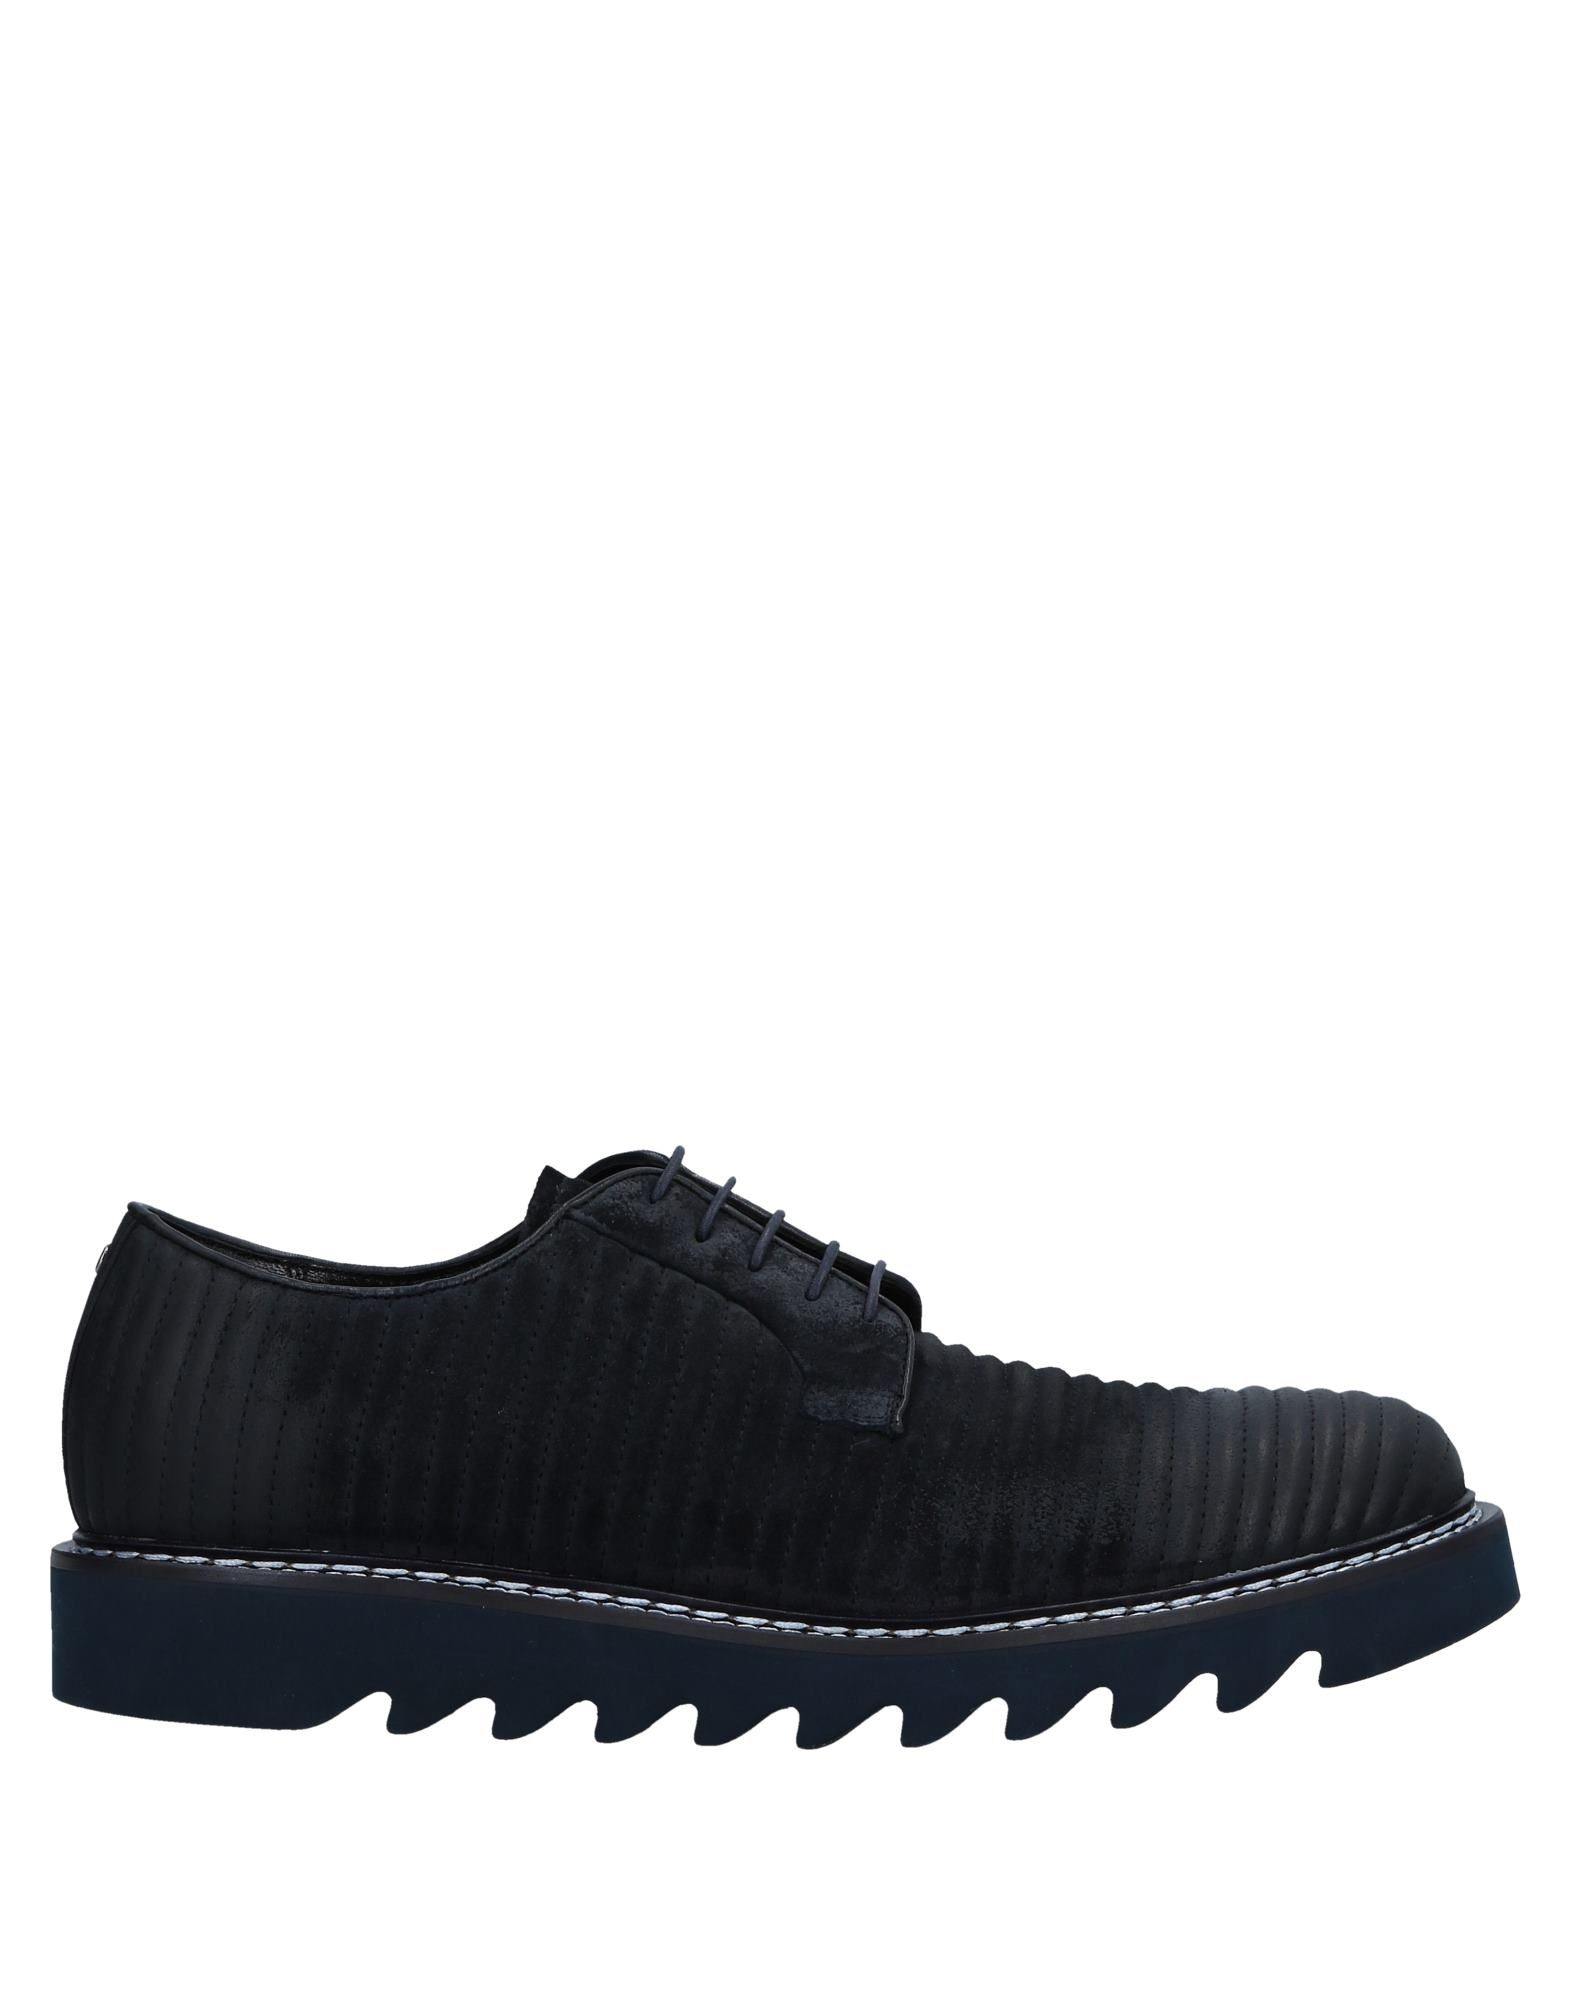 Cesare Paciotti Schnürschuhe Herren  Schuhe 11535072JX Gute Qualität beliebte Schuhe  fa6b2b